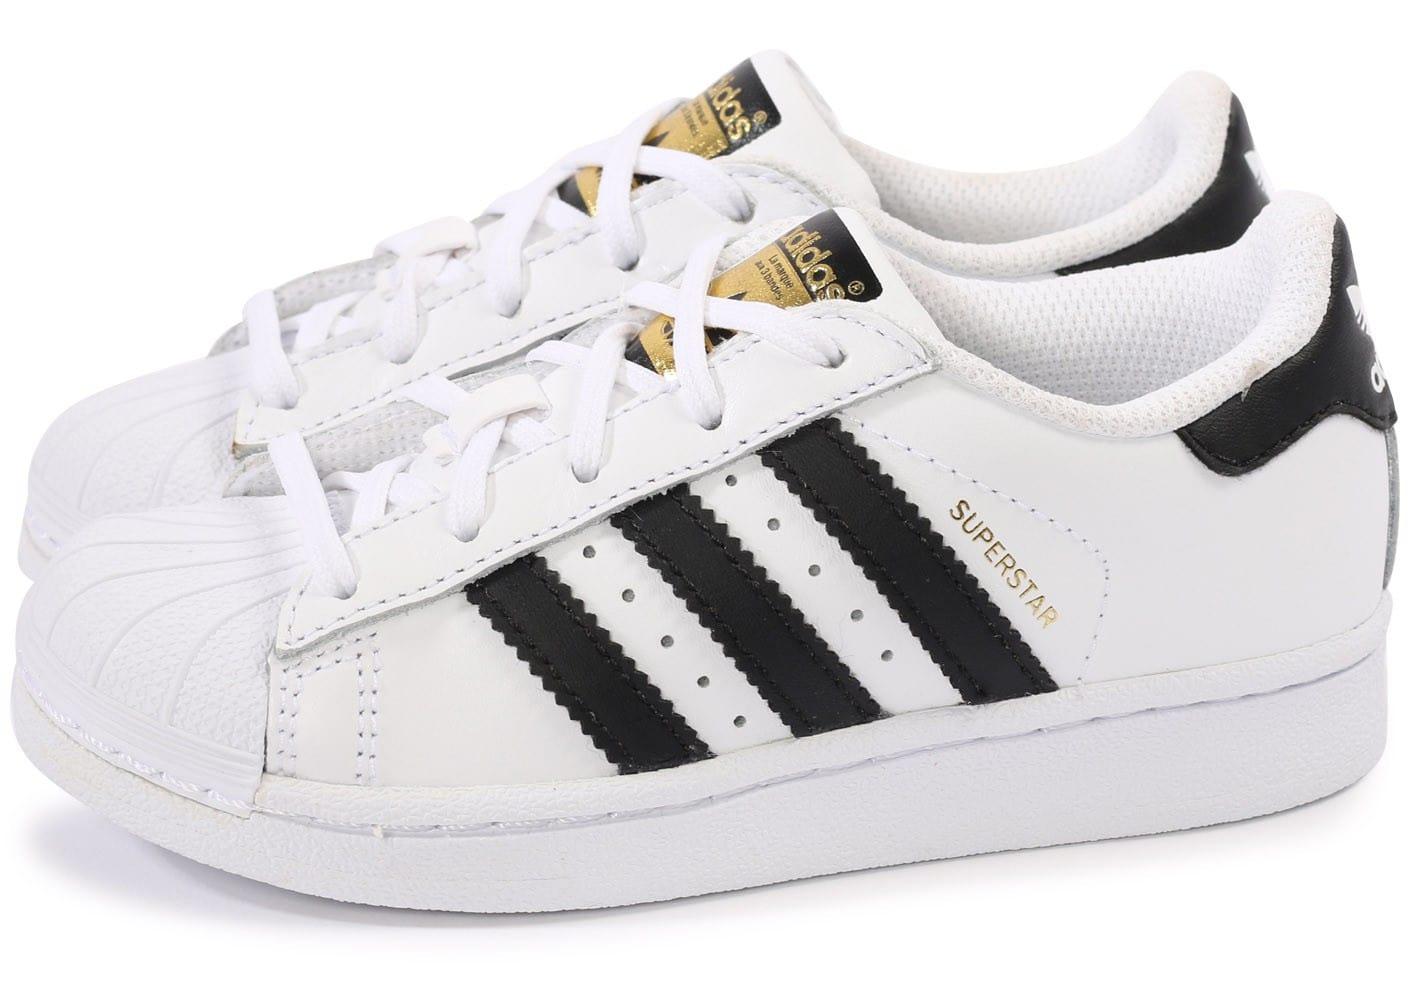 Promotion de groupe adidas superstar blanc